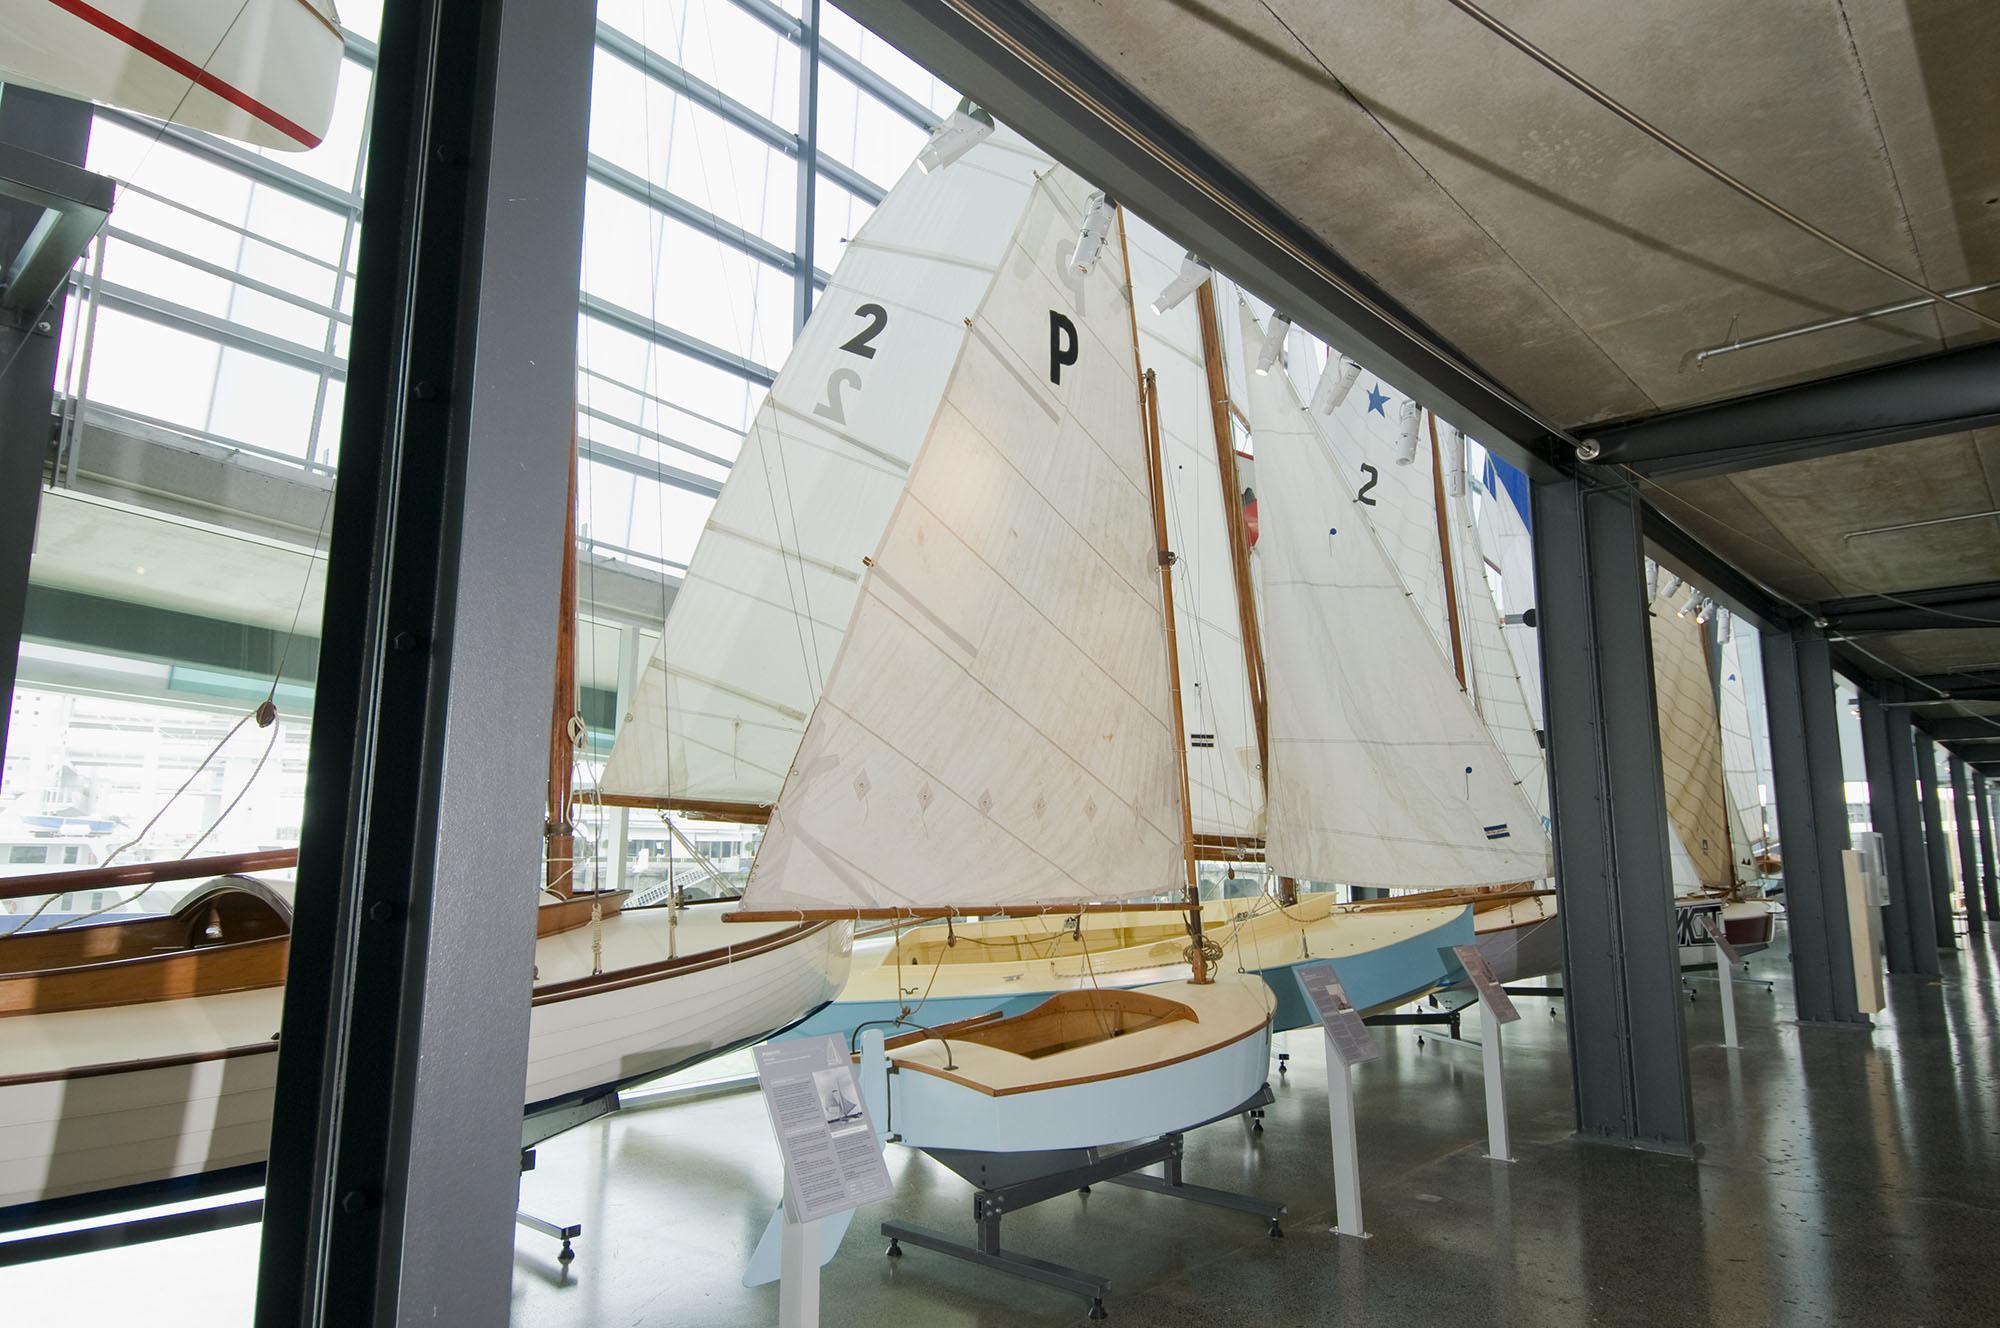 https://rfacdn.nz/maritime/assets/media/bwbm-yachting-hall-gallery.jpg